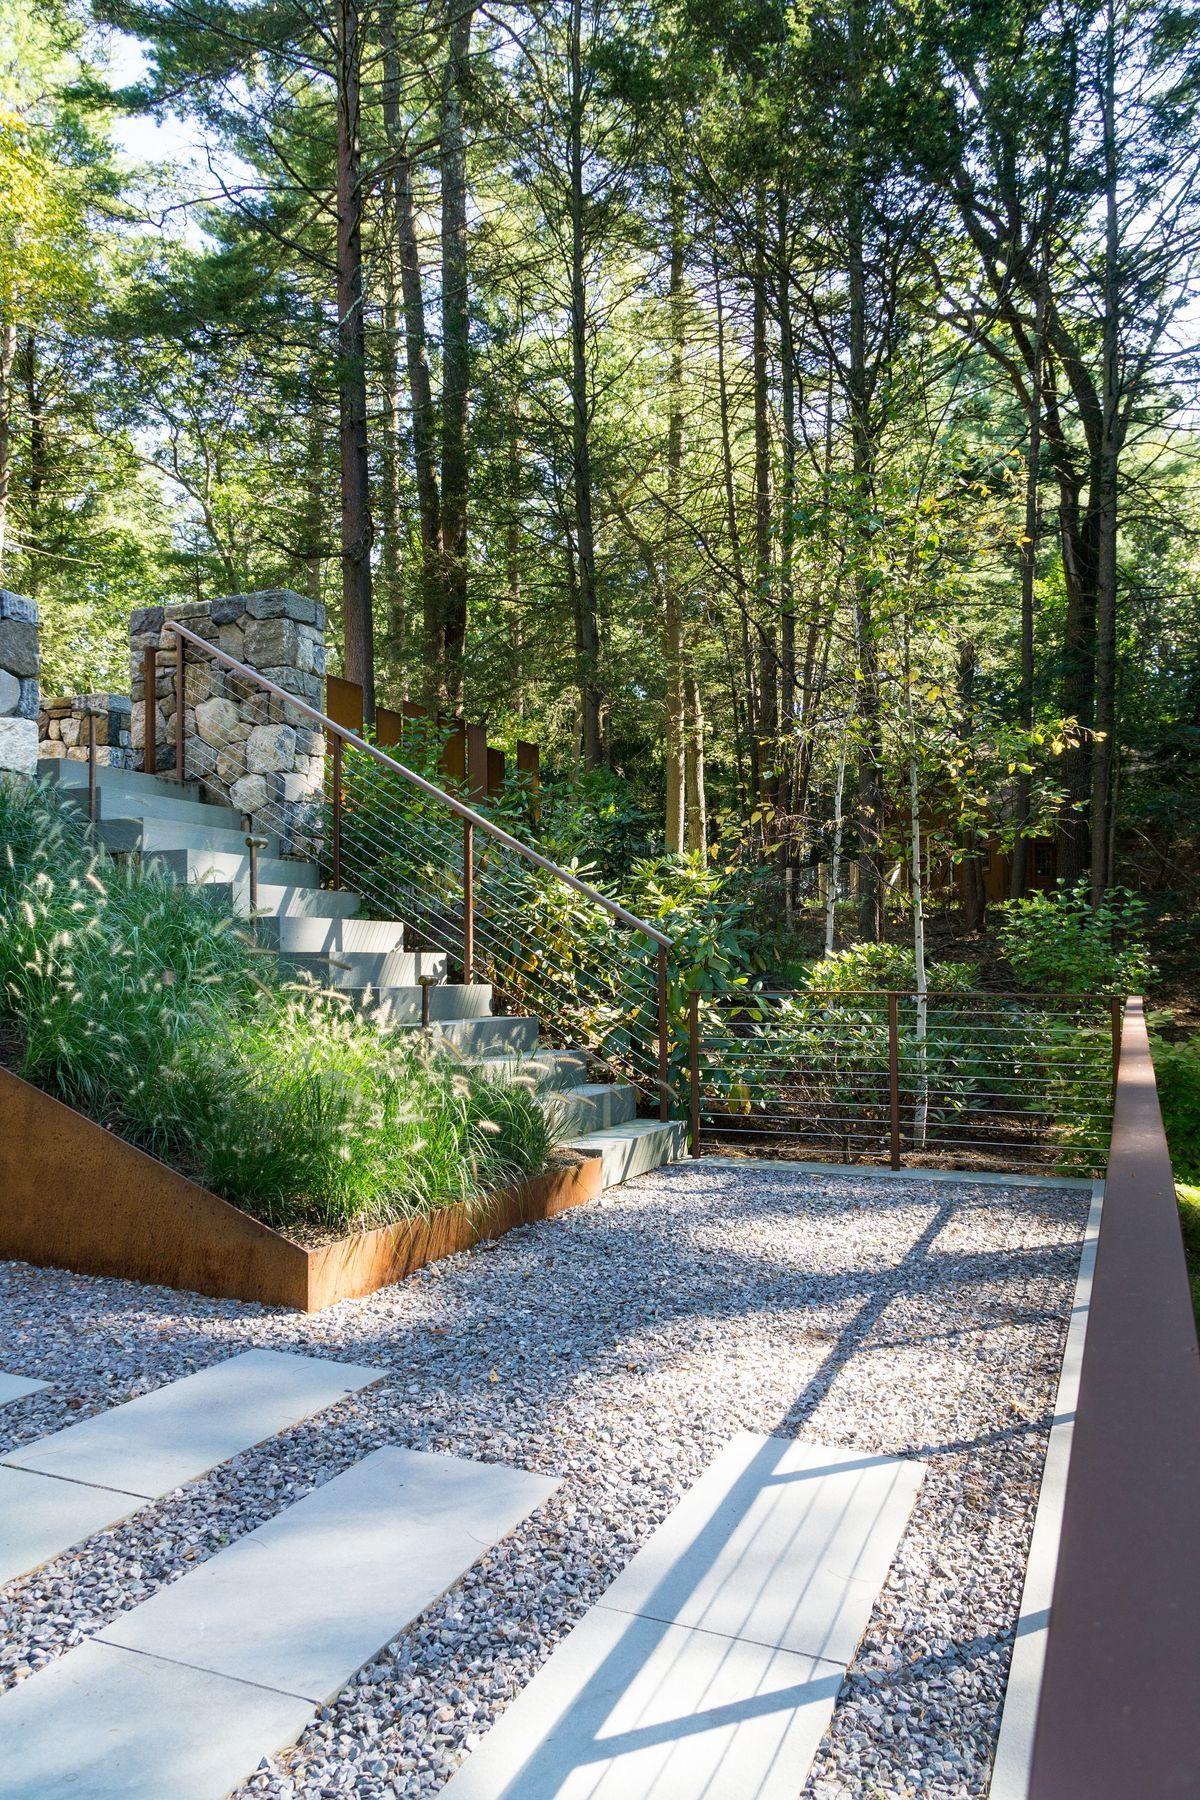 ANDLC-Lincoln Corten Planter Wall and back patio 3.jpg